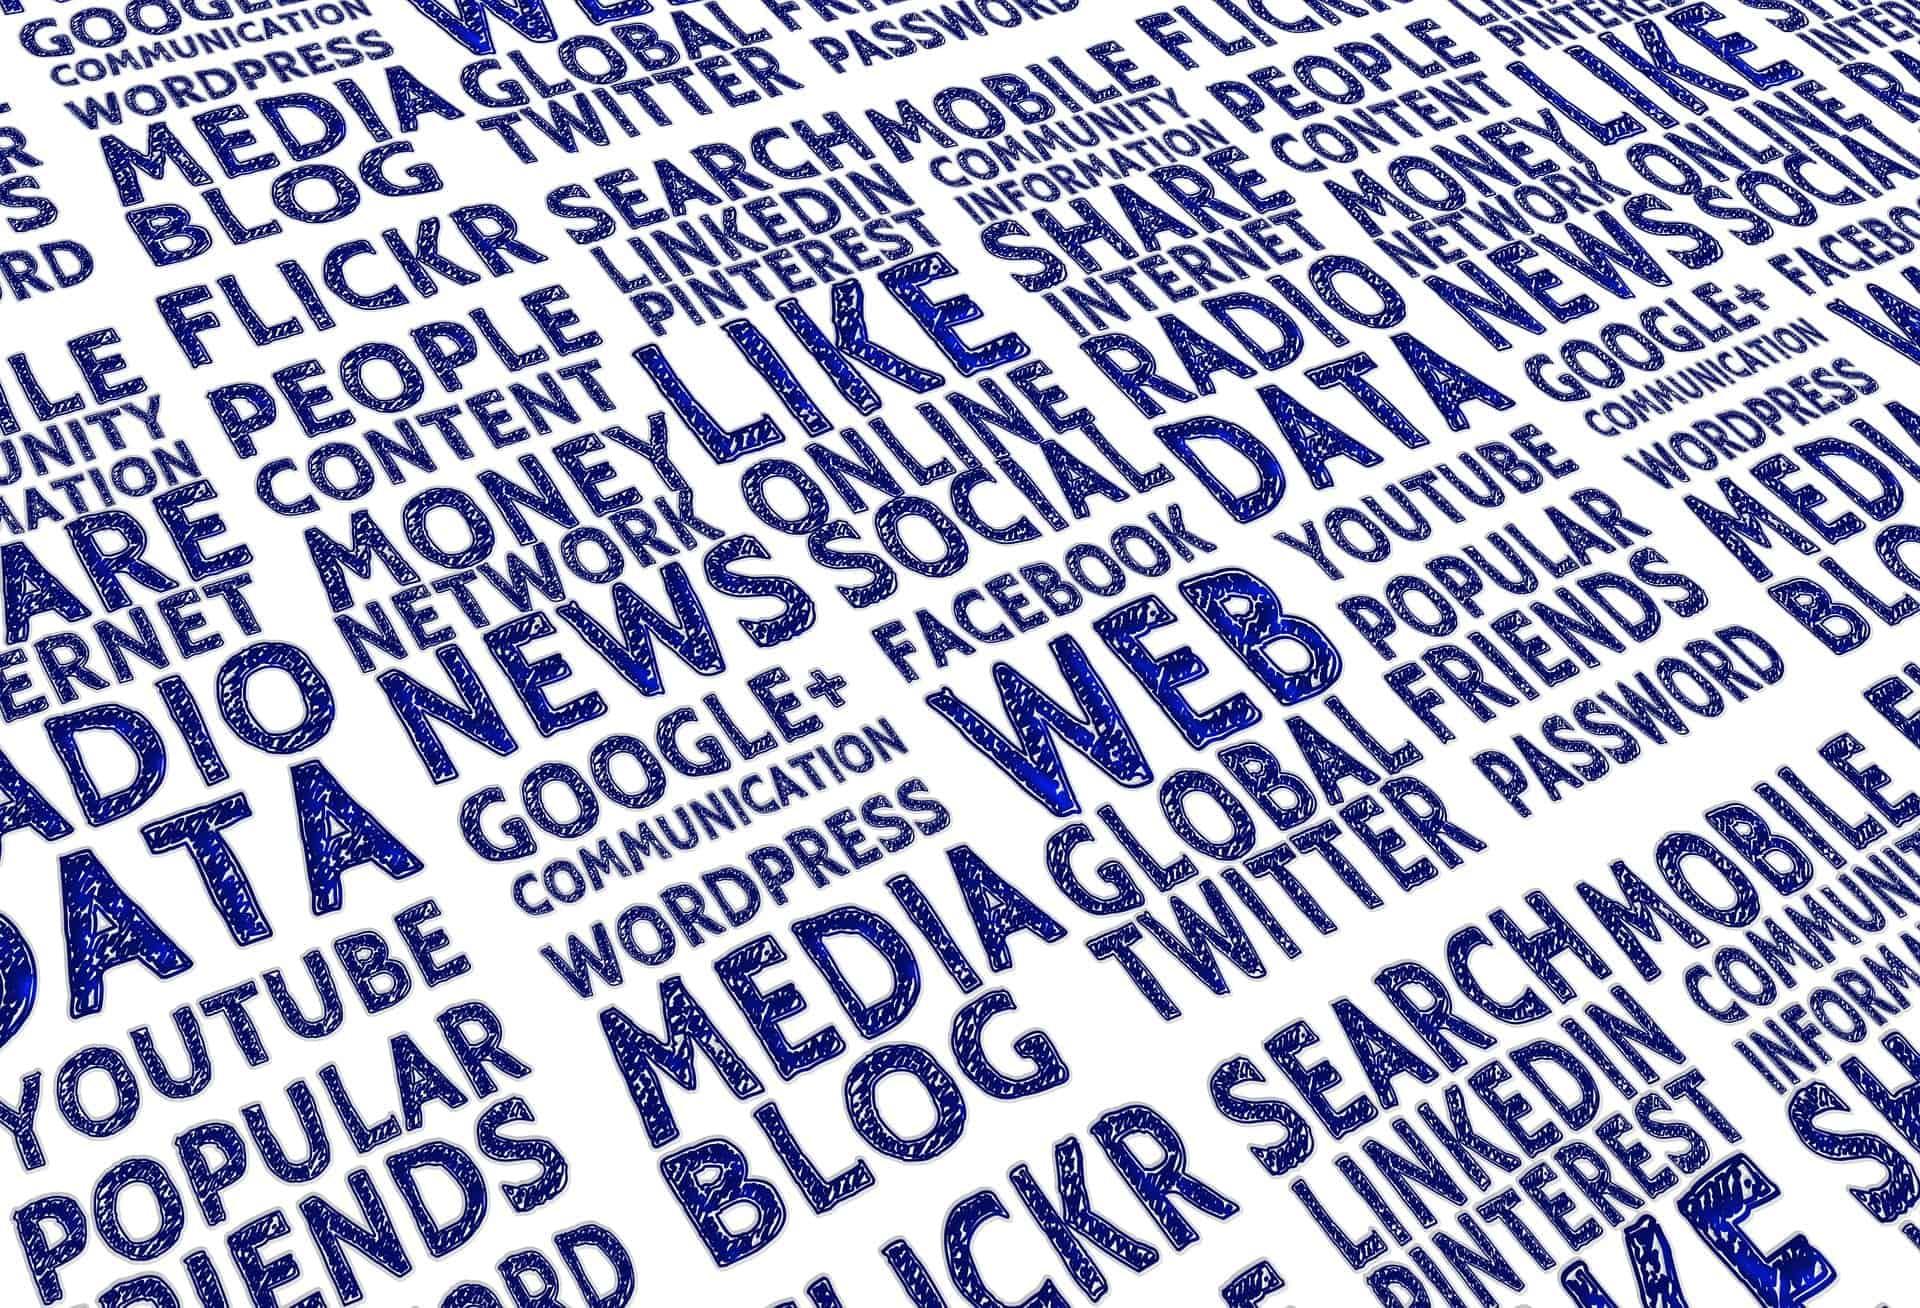 Time Saving Tools for Social Media Marketing | List of Social Media Platforms | eClincher